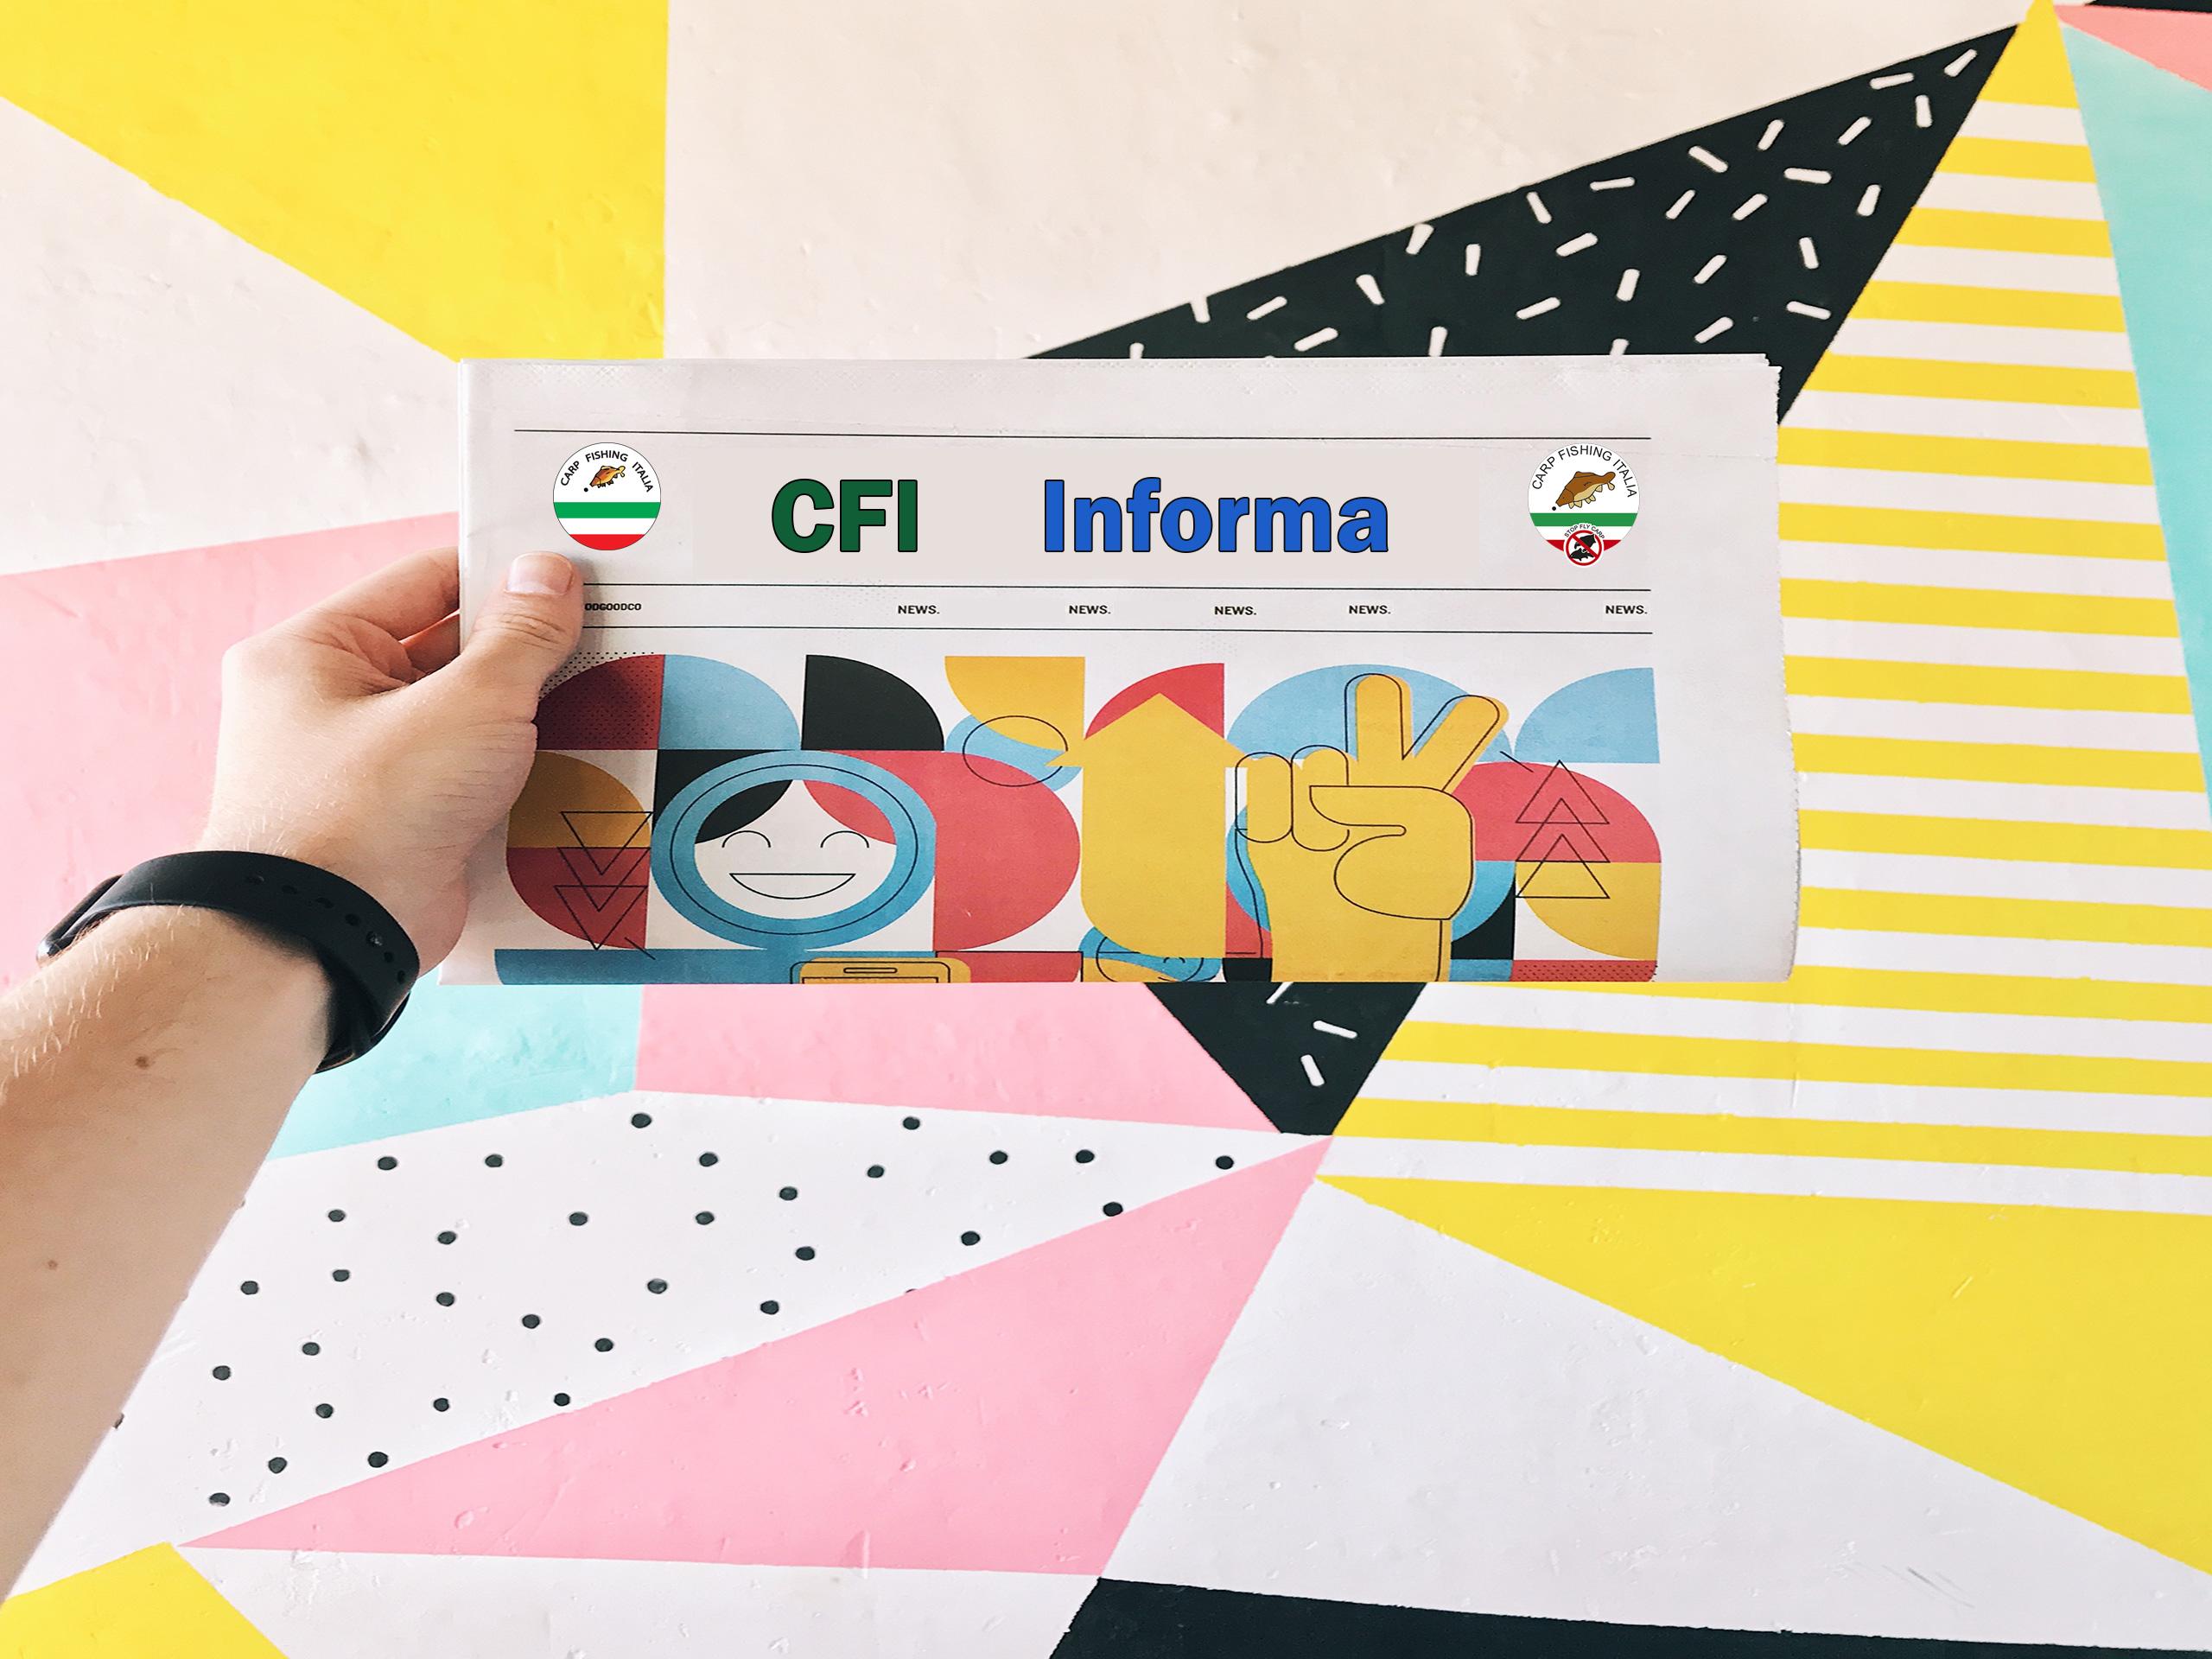 CFI Informa